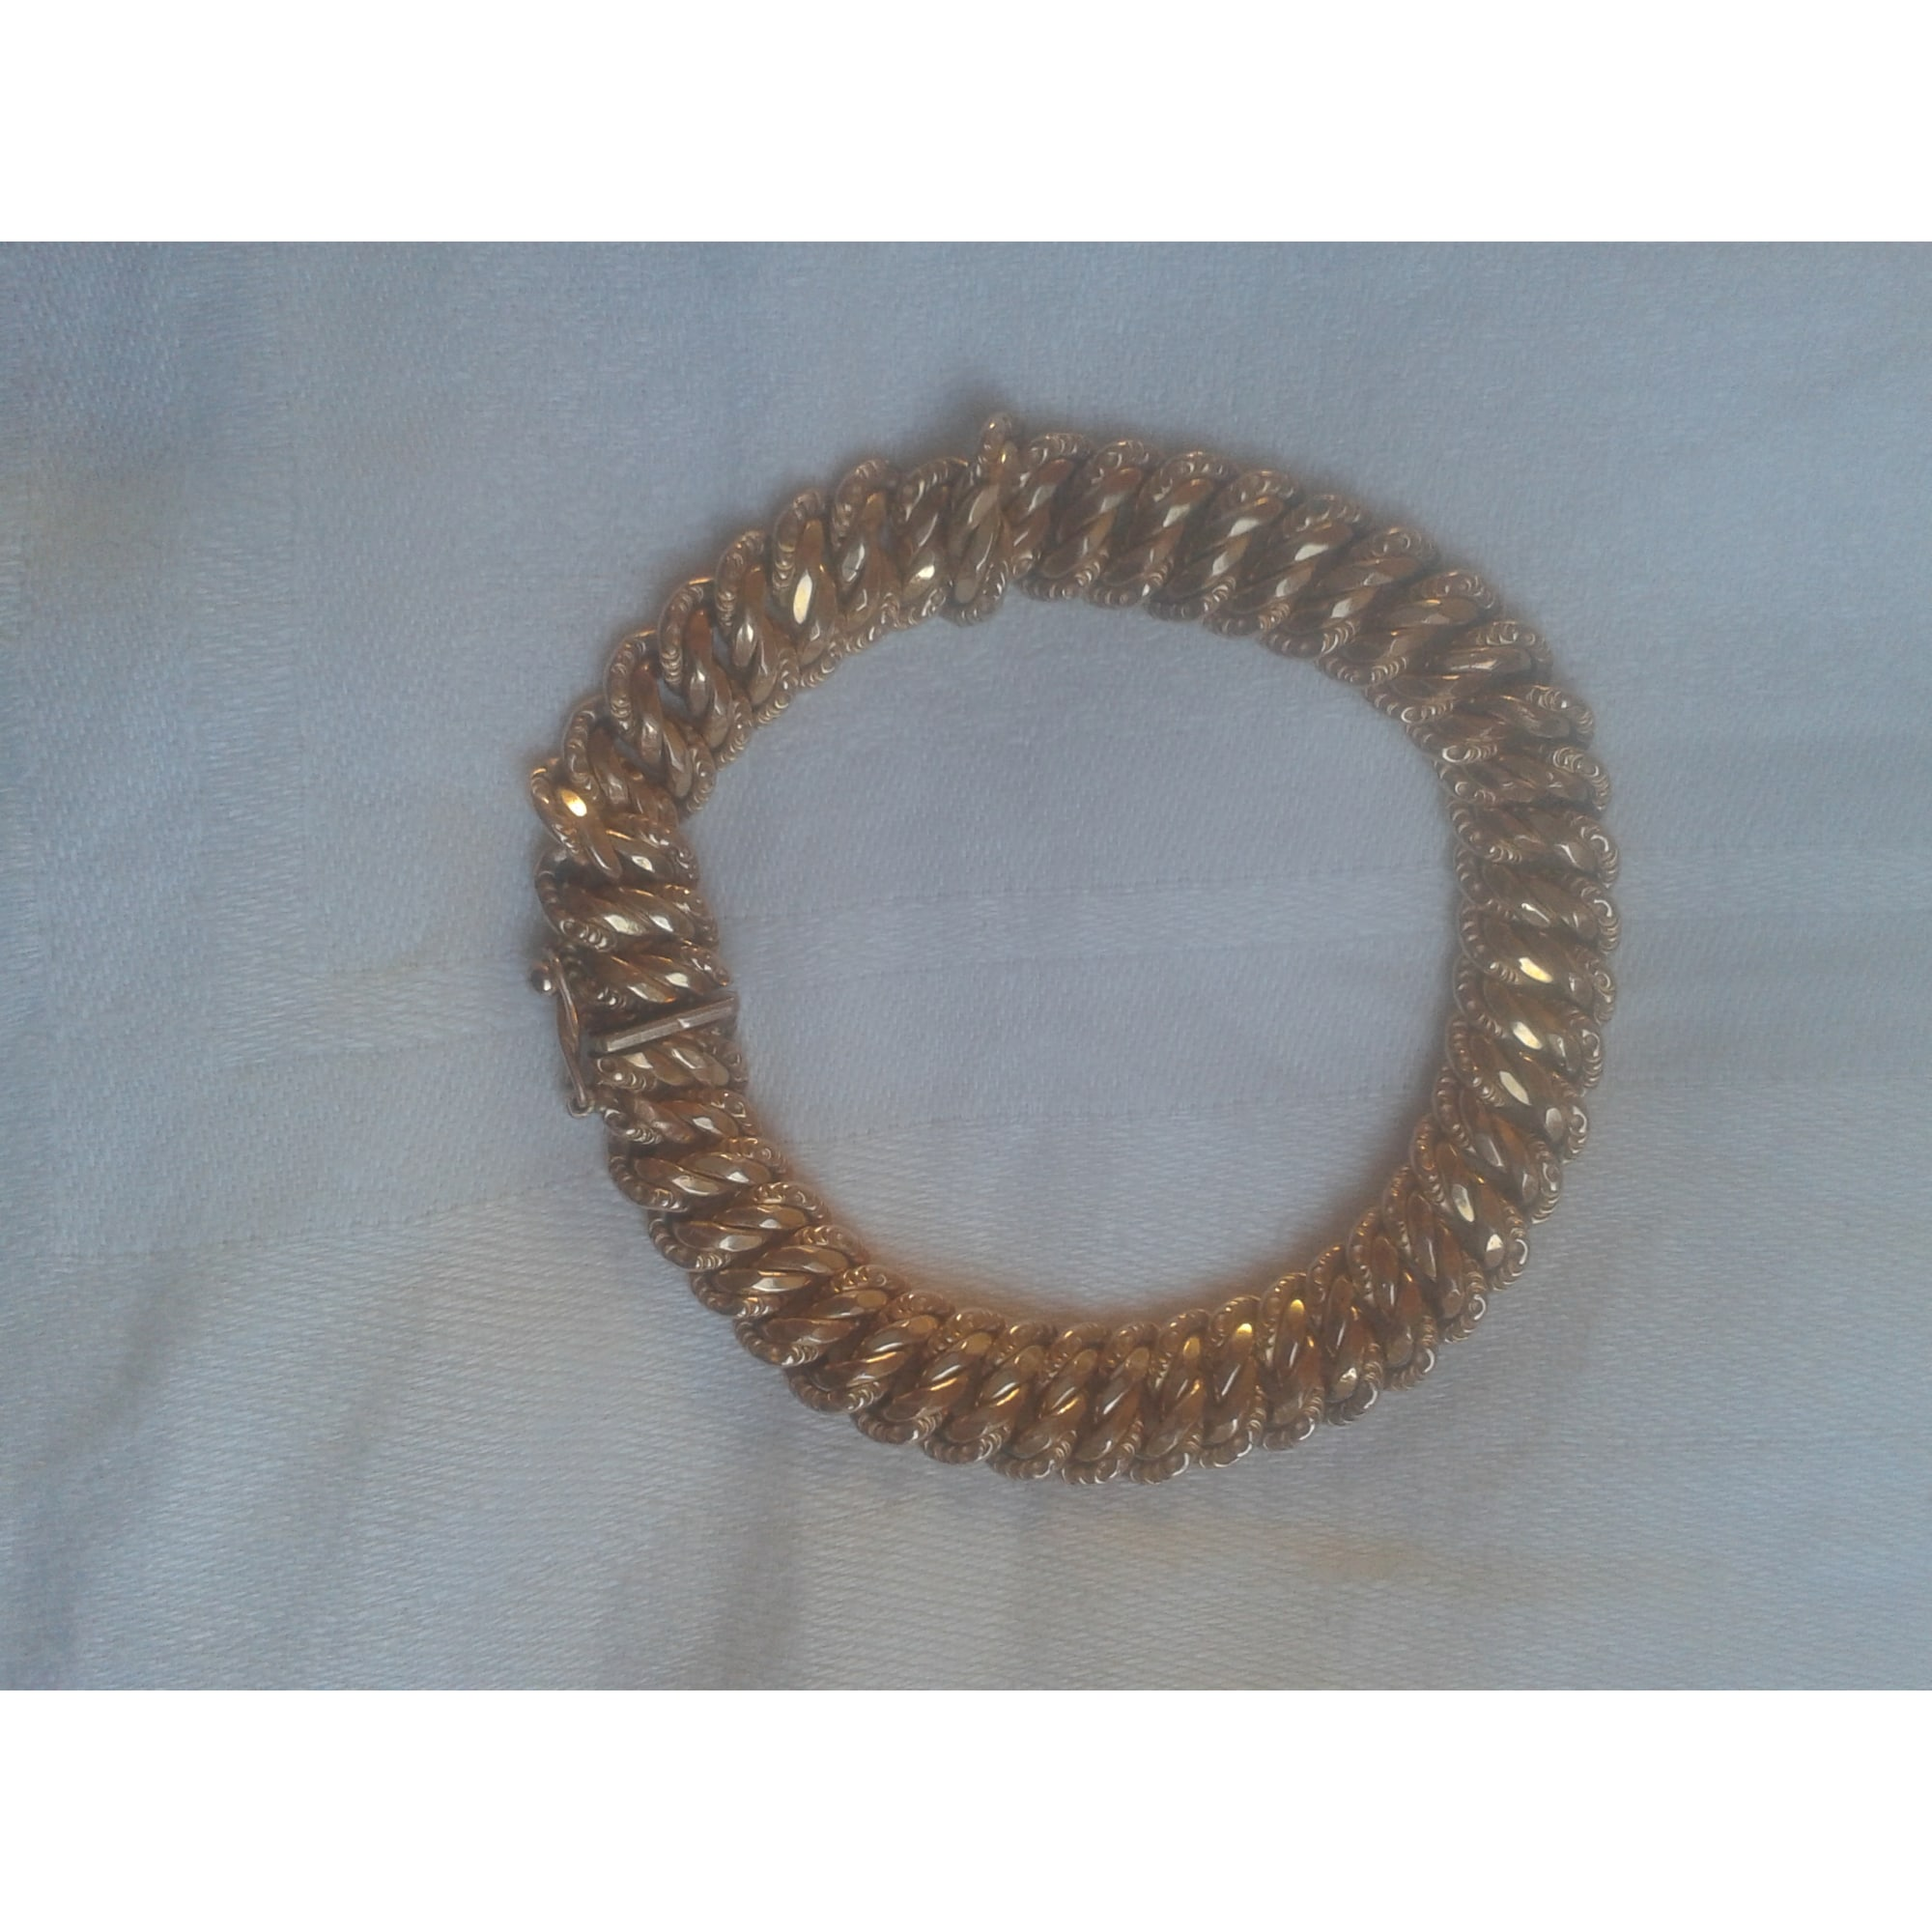 Bracelet Murat Doré Vendu Par Christine257138 4269105